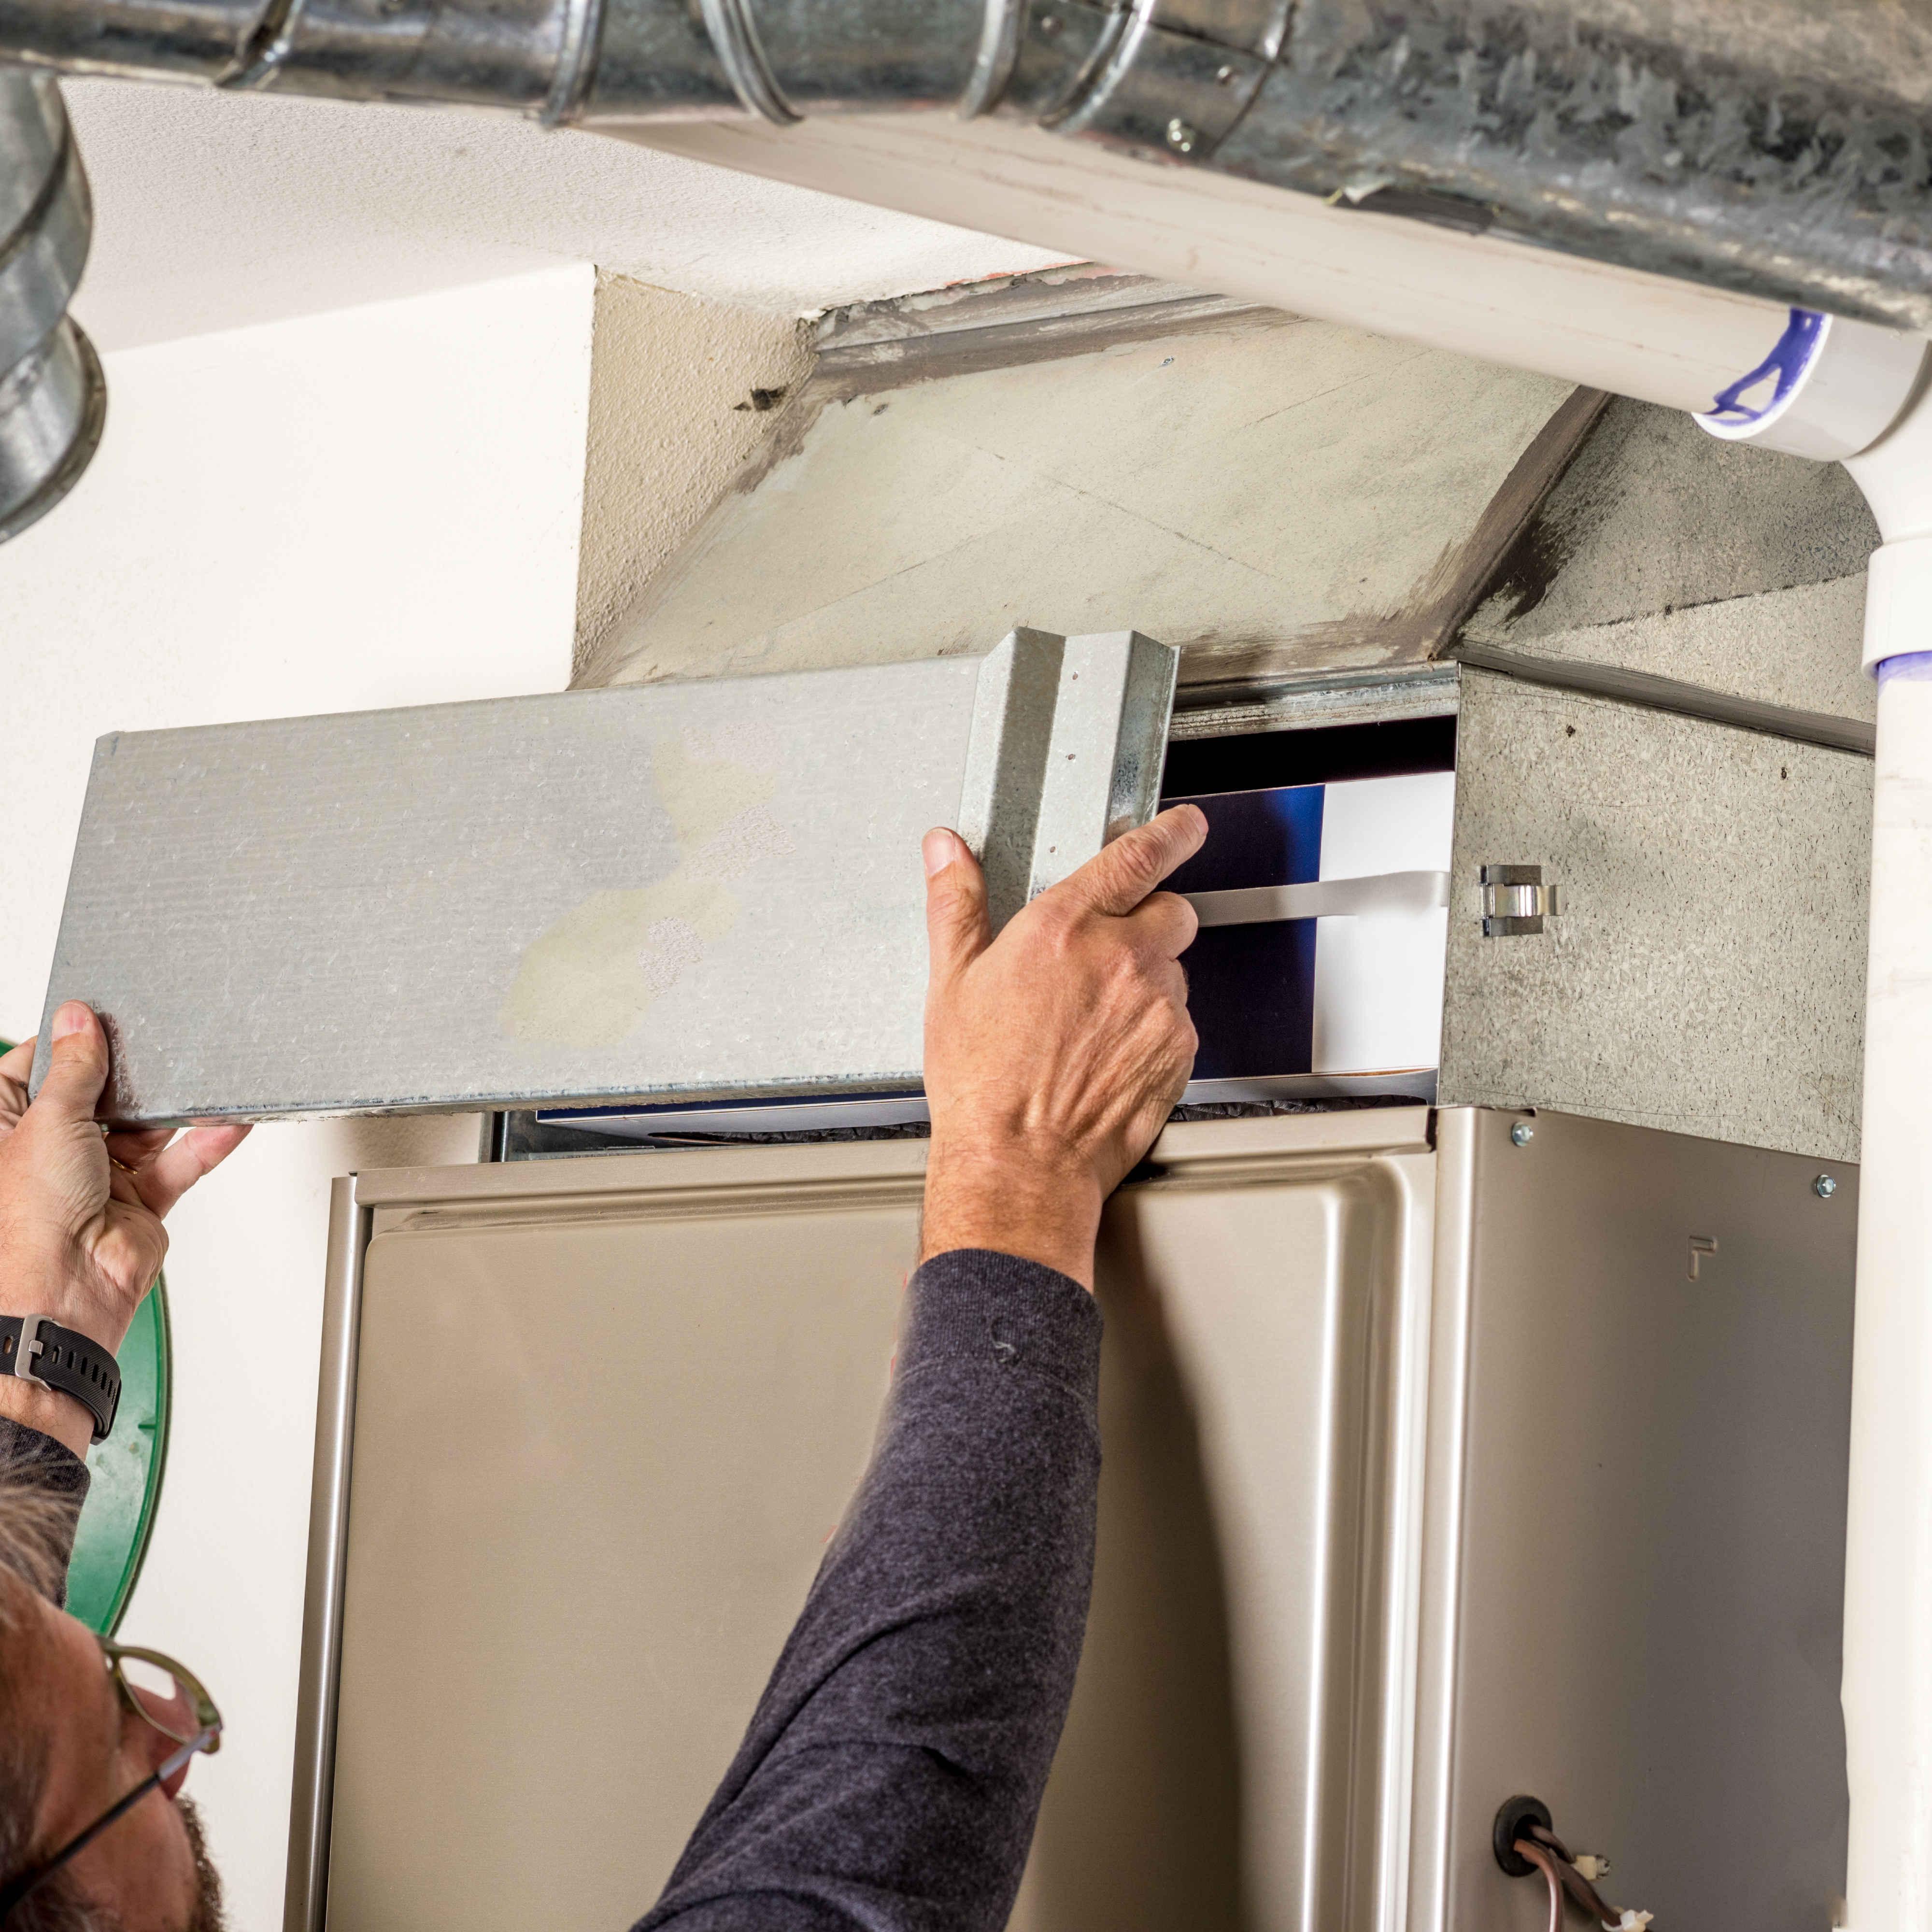 furnace troubleshooting interactive photo